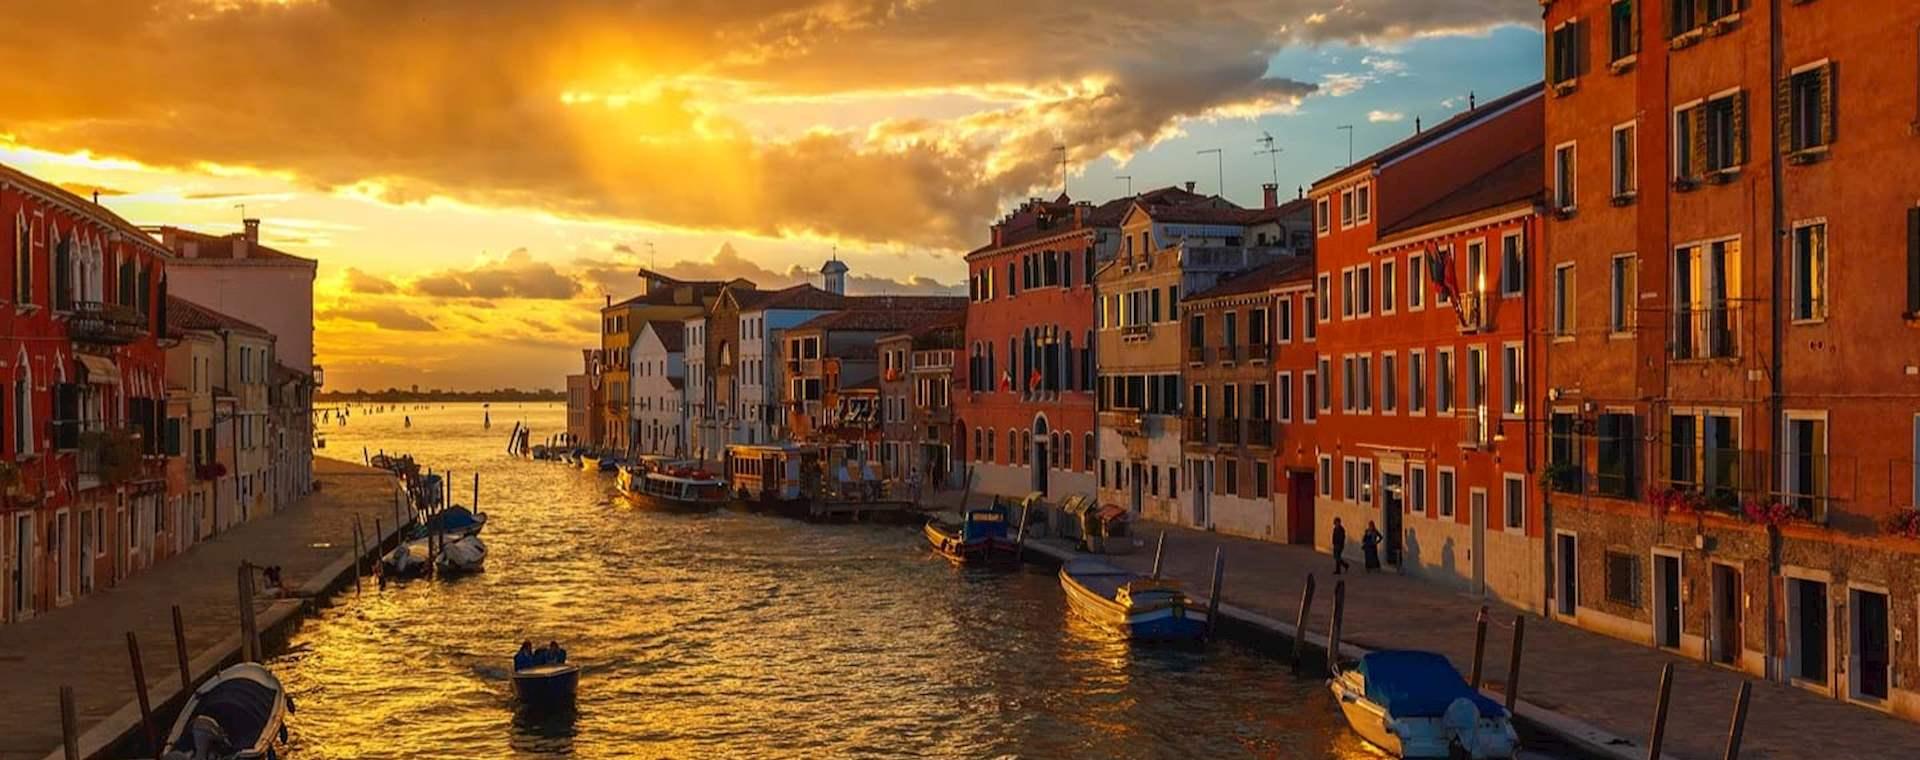 Wine & Cicchetti Tasting Tour through Venice's Jewish Ghetto